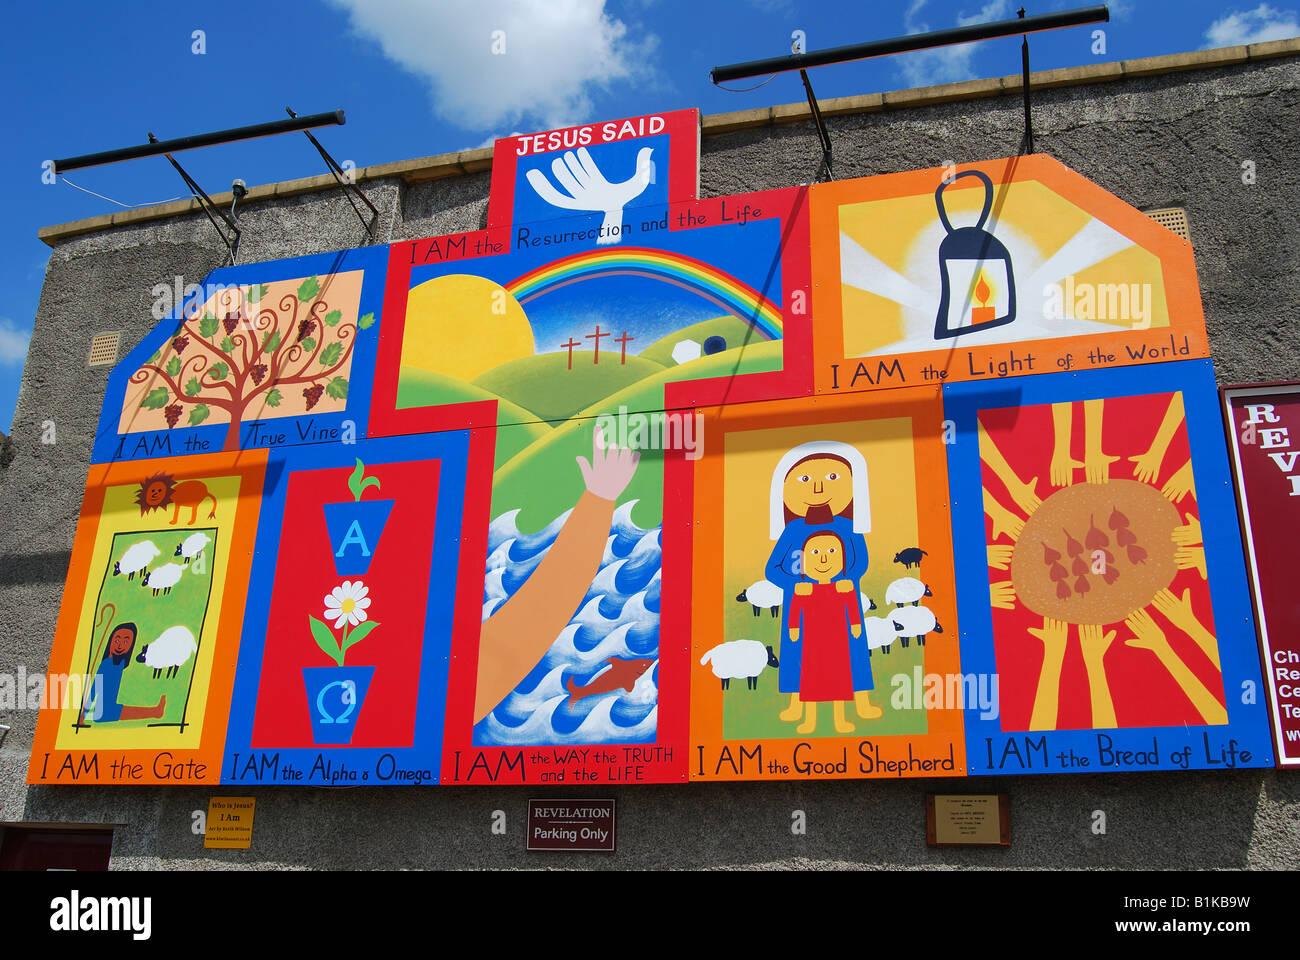 Millenium Children's Christian Mural, Chippenham, Wiltshire, England, United Kingdom - Stock Image